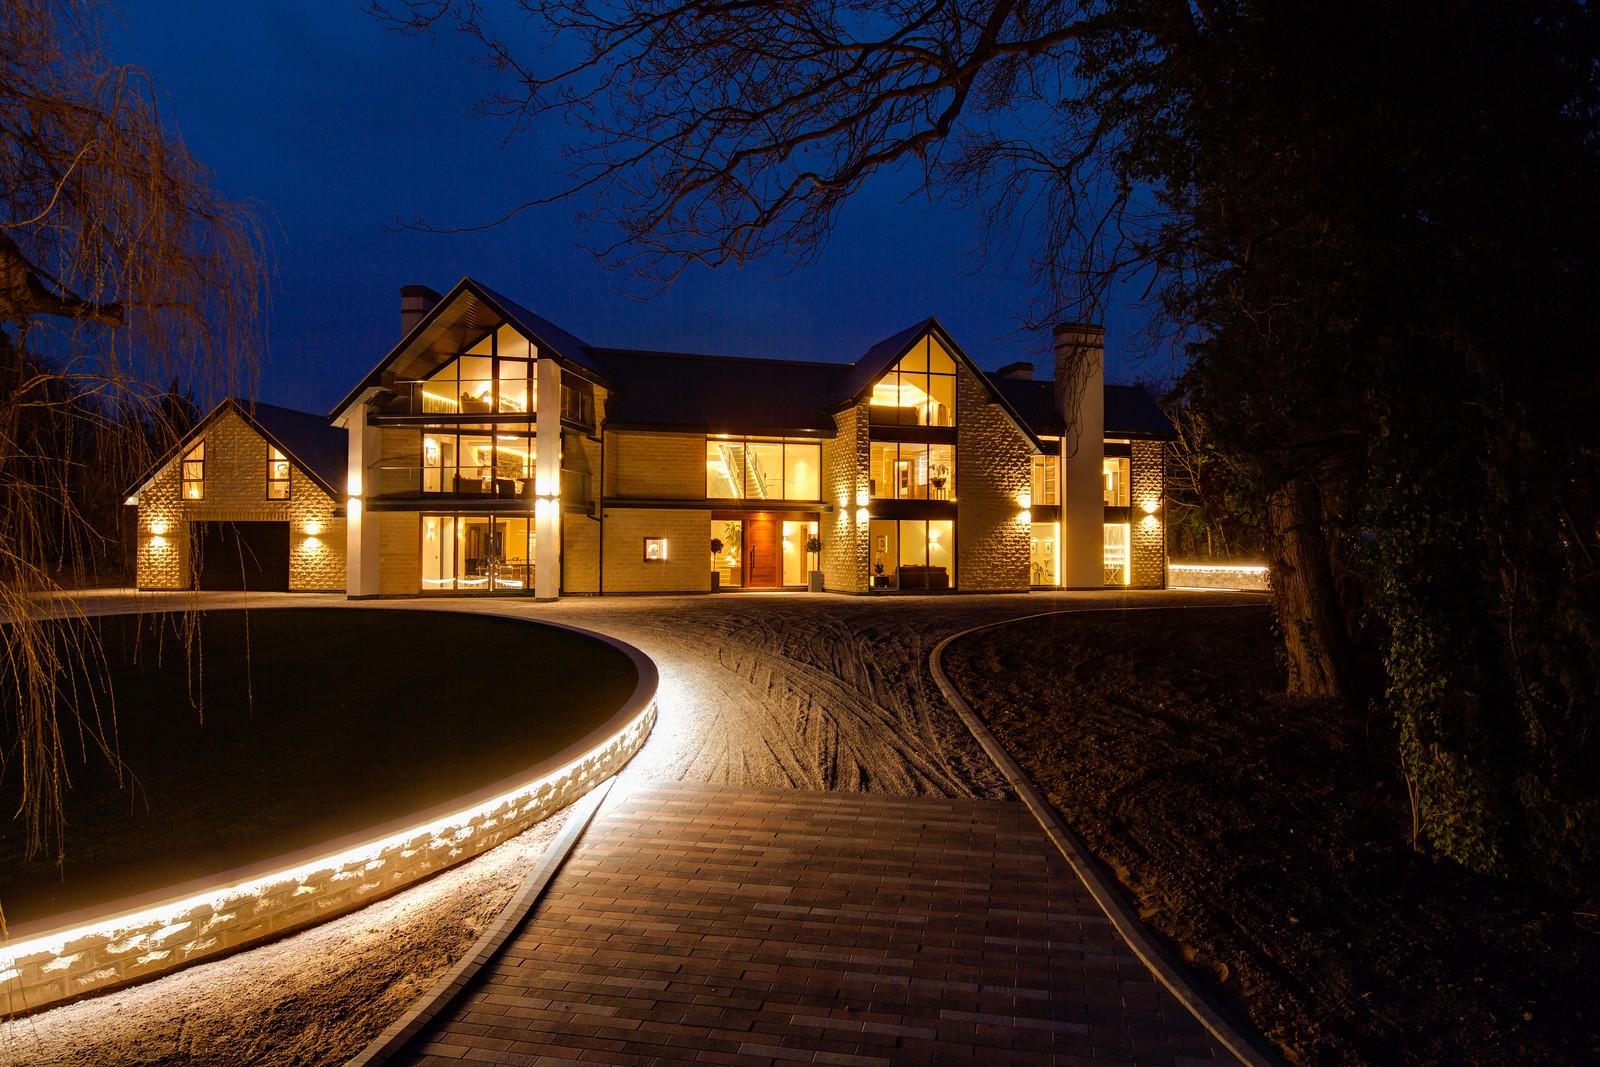 Tanglewood, Colston Bassett, luxury home at dusk by Guy Phoenix